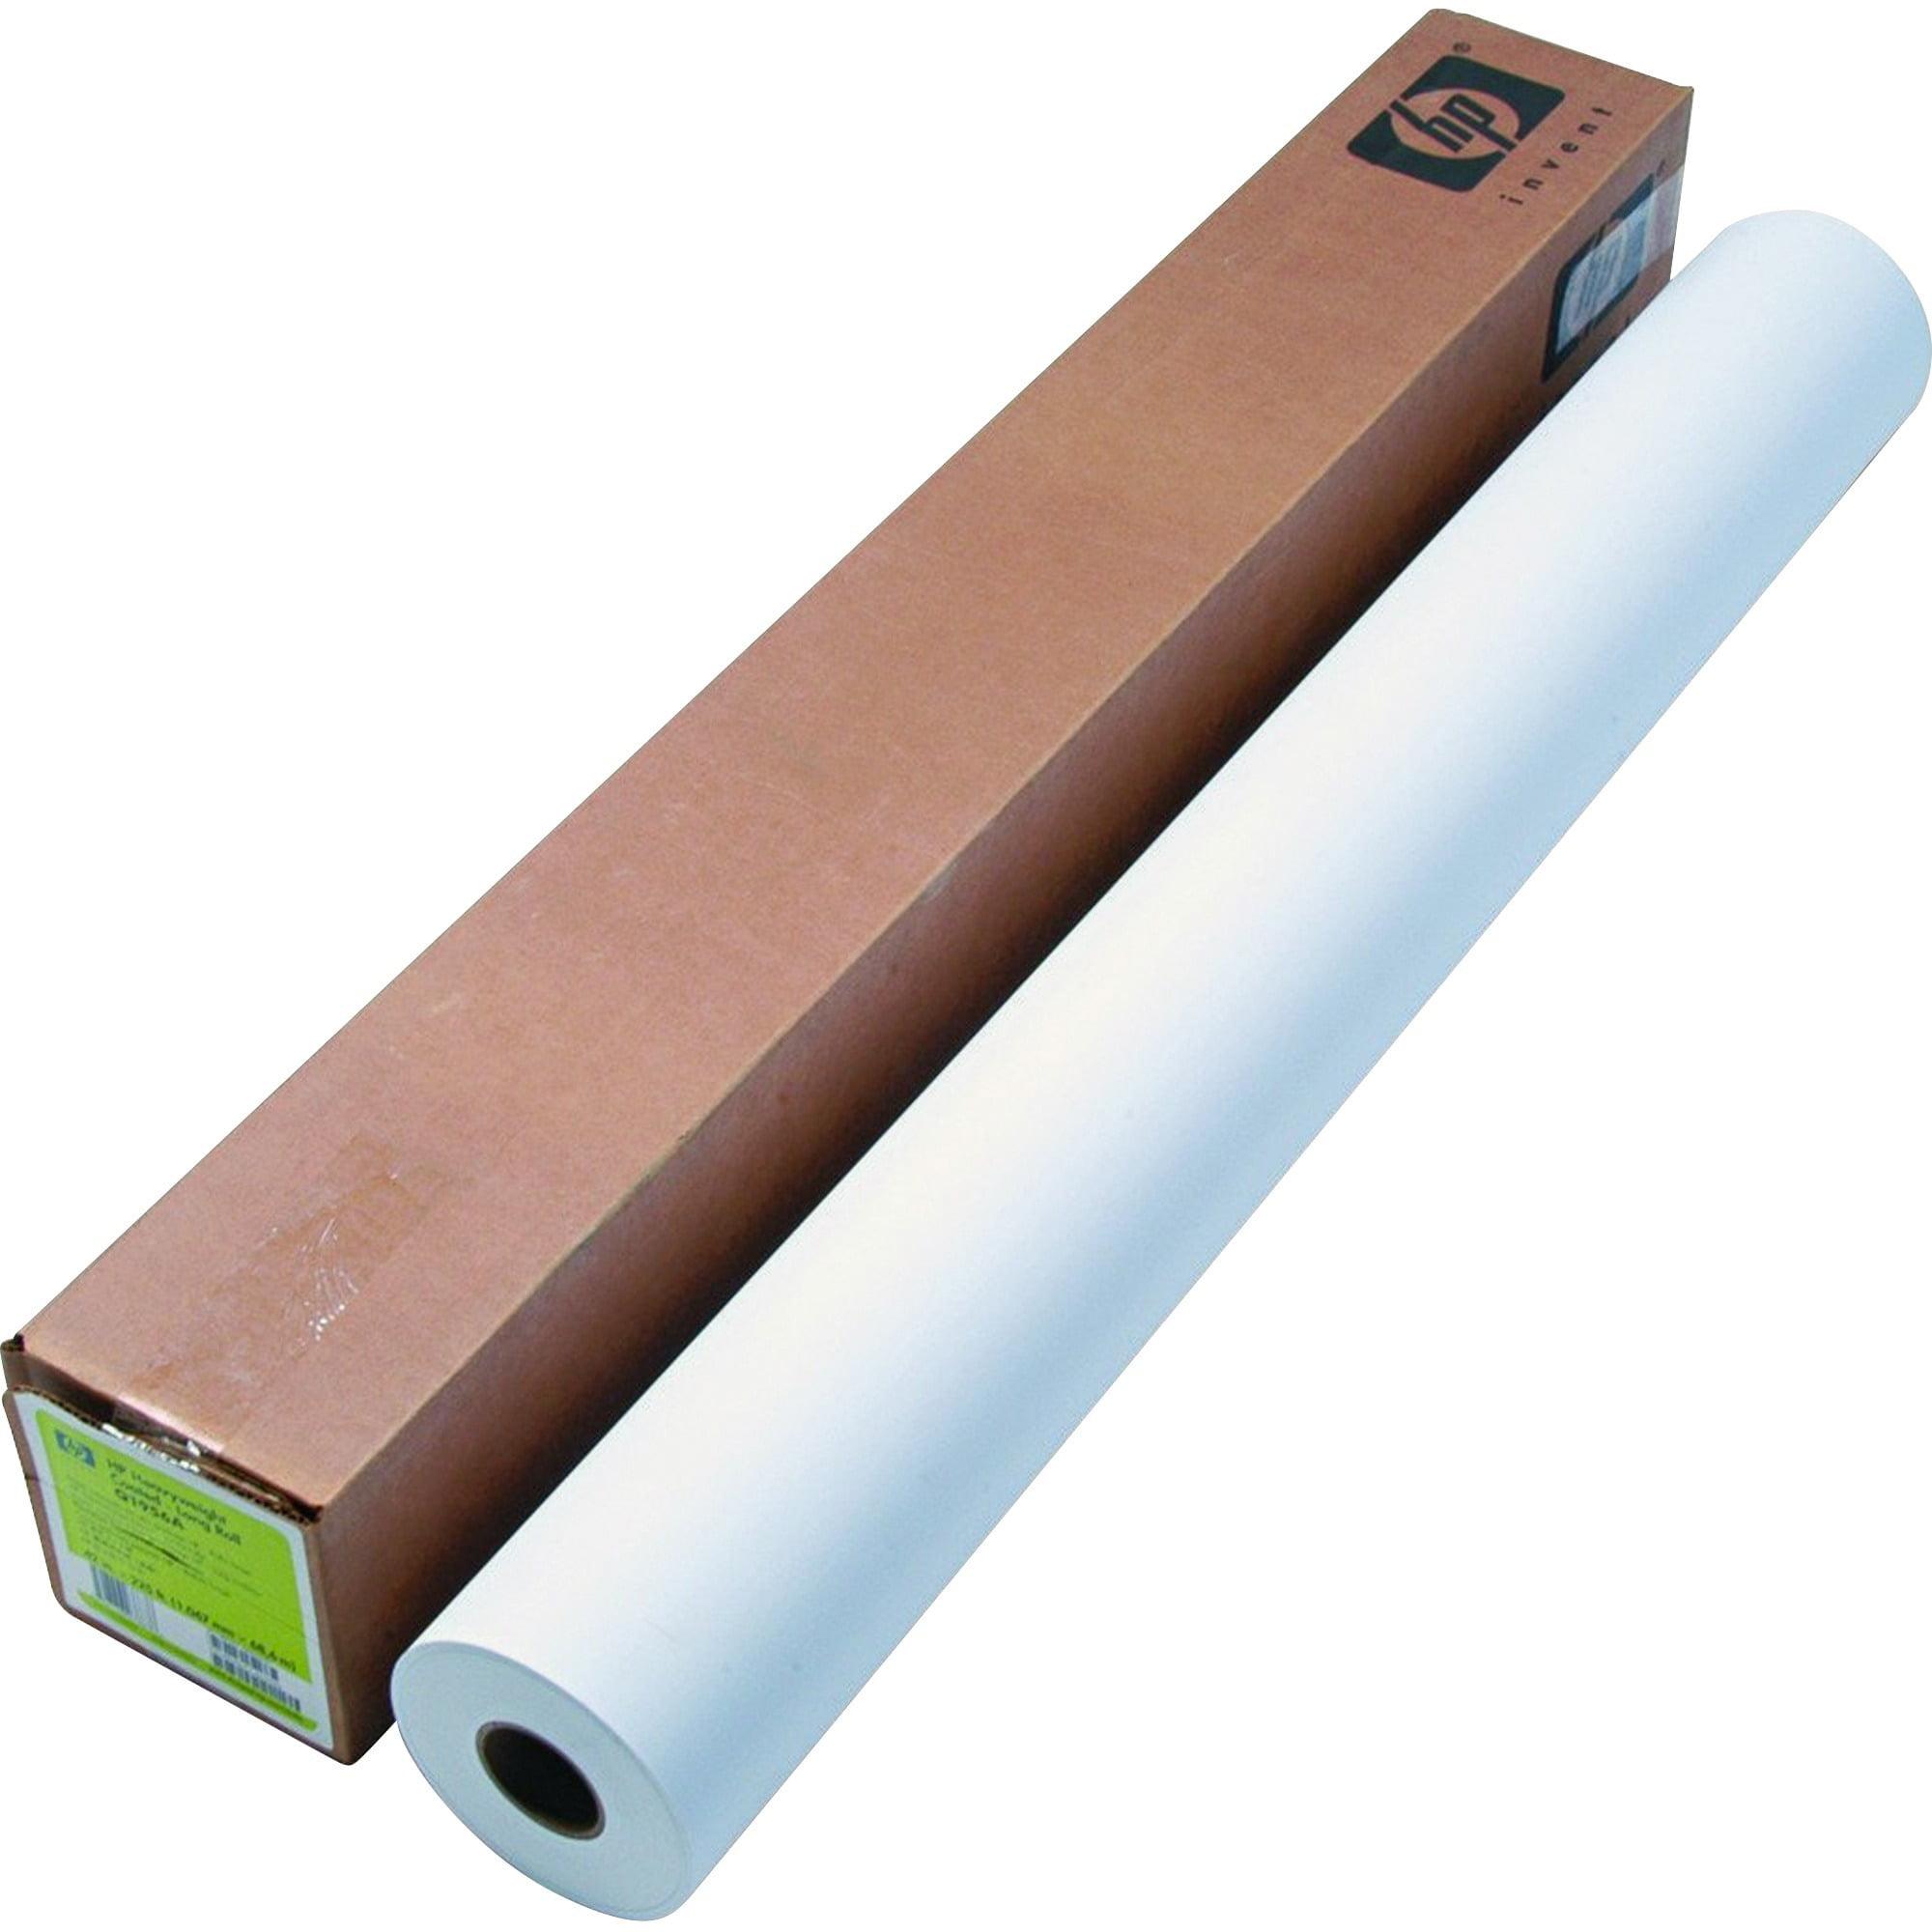 "HP Designjet Inkjet Large Format Paper, 6.6 mil, 42"" x 225 ft, White"